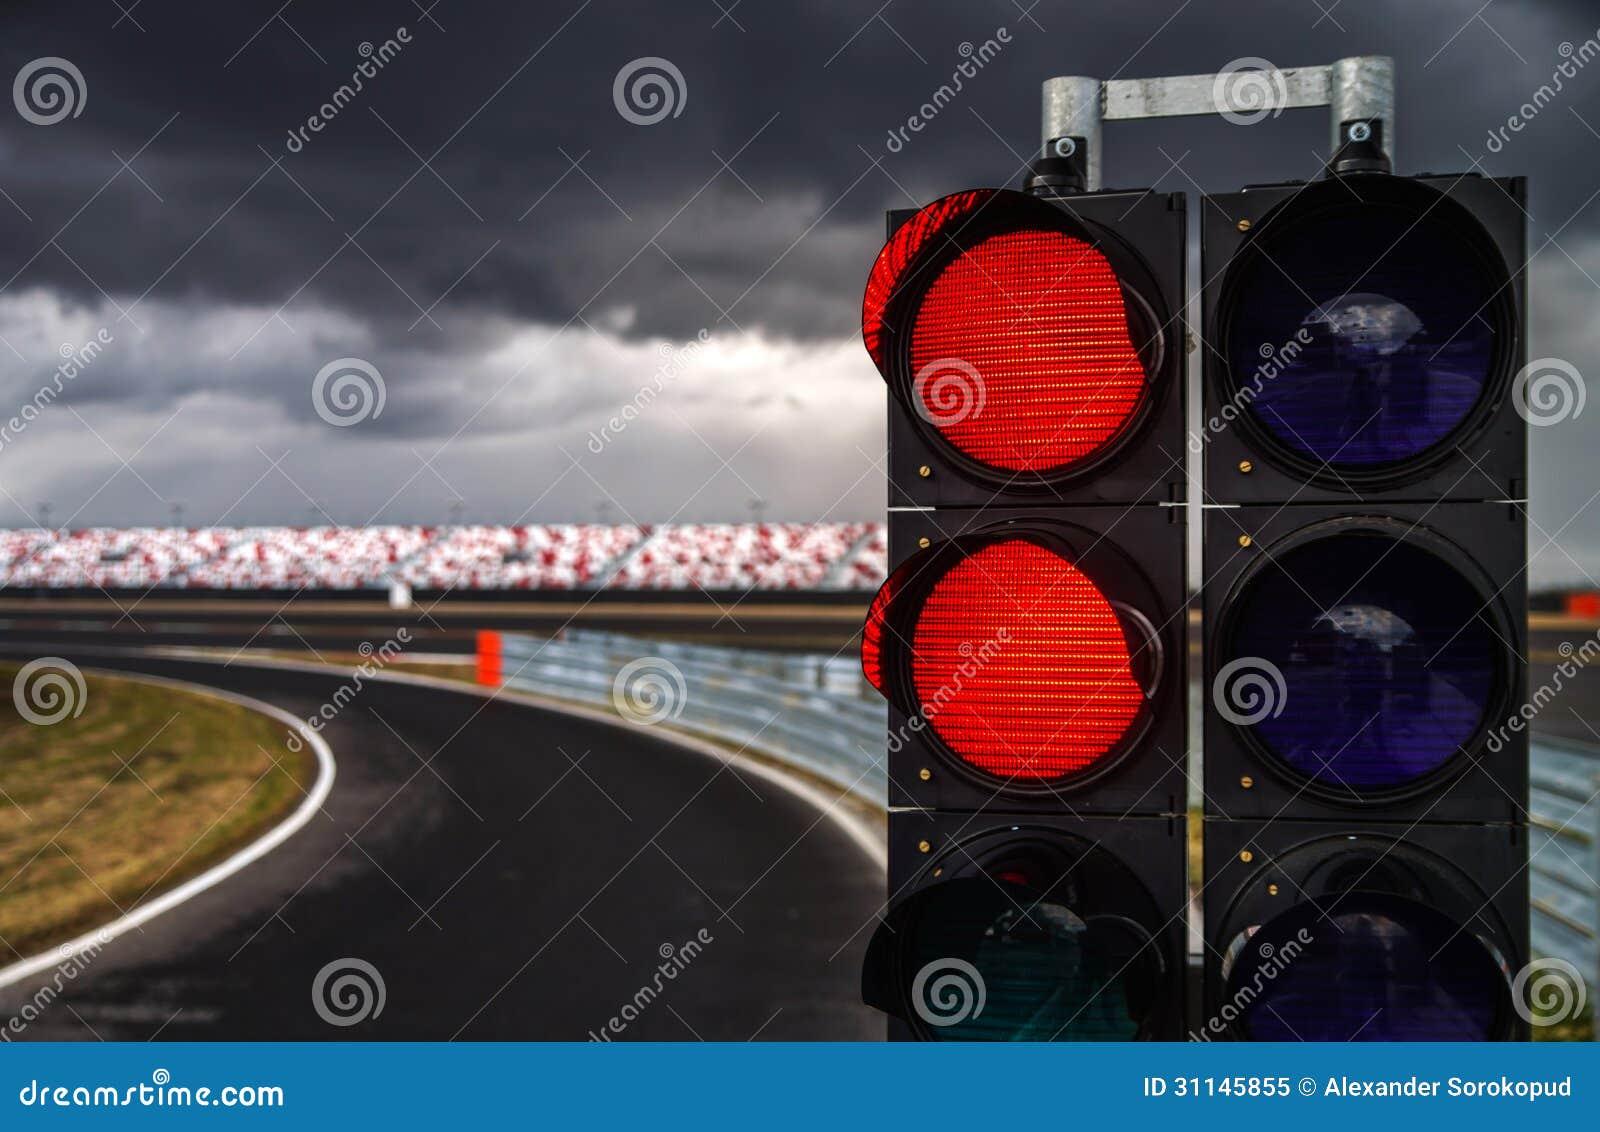 Traffic light on race track stock image image of contrast traffic light on race track contrast autodrome aloadofball Gallery